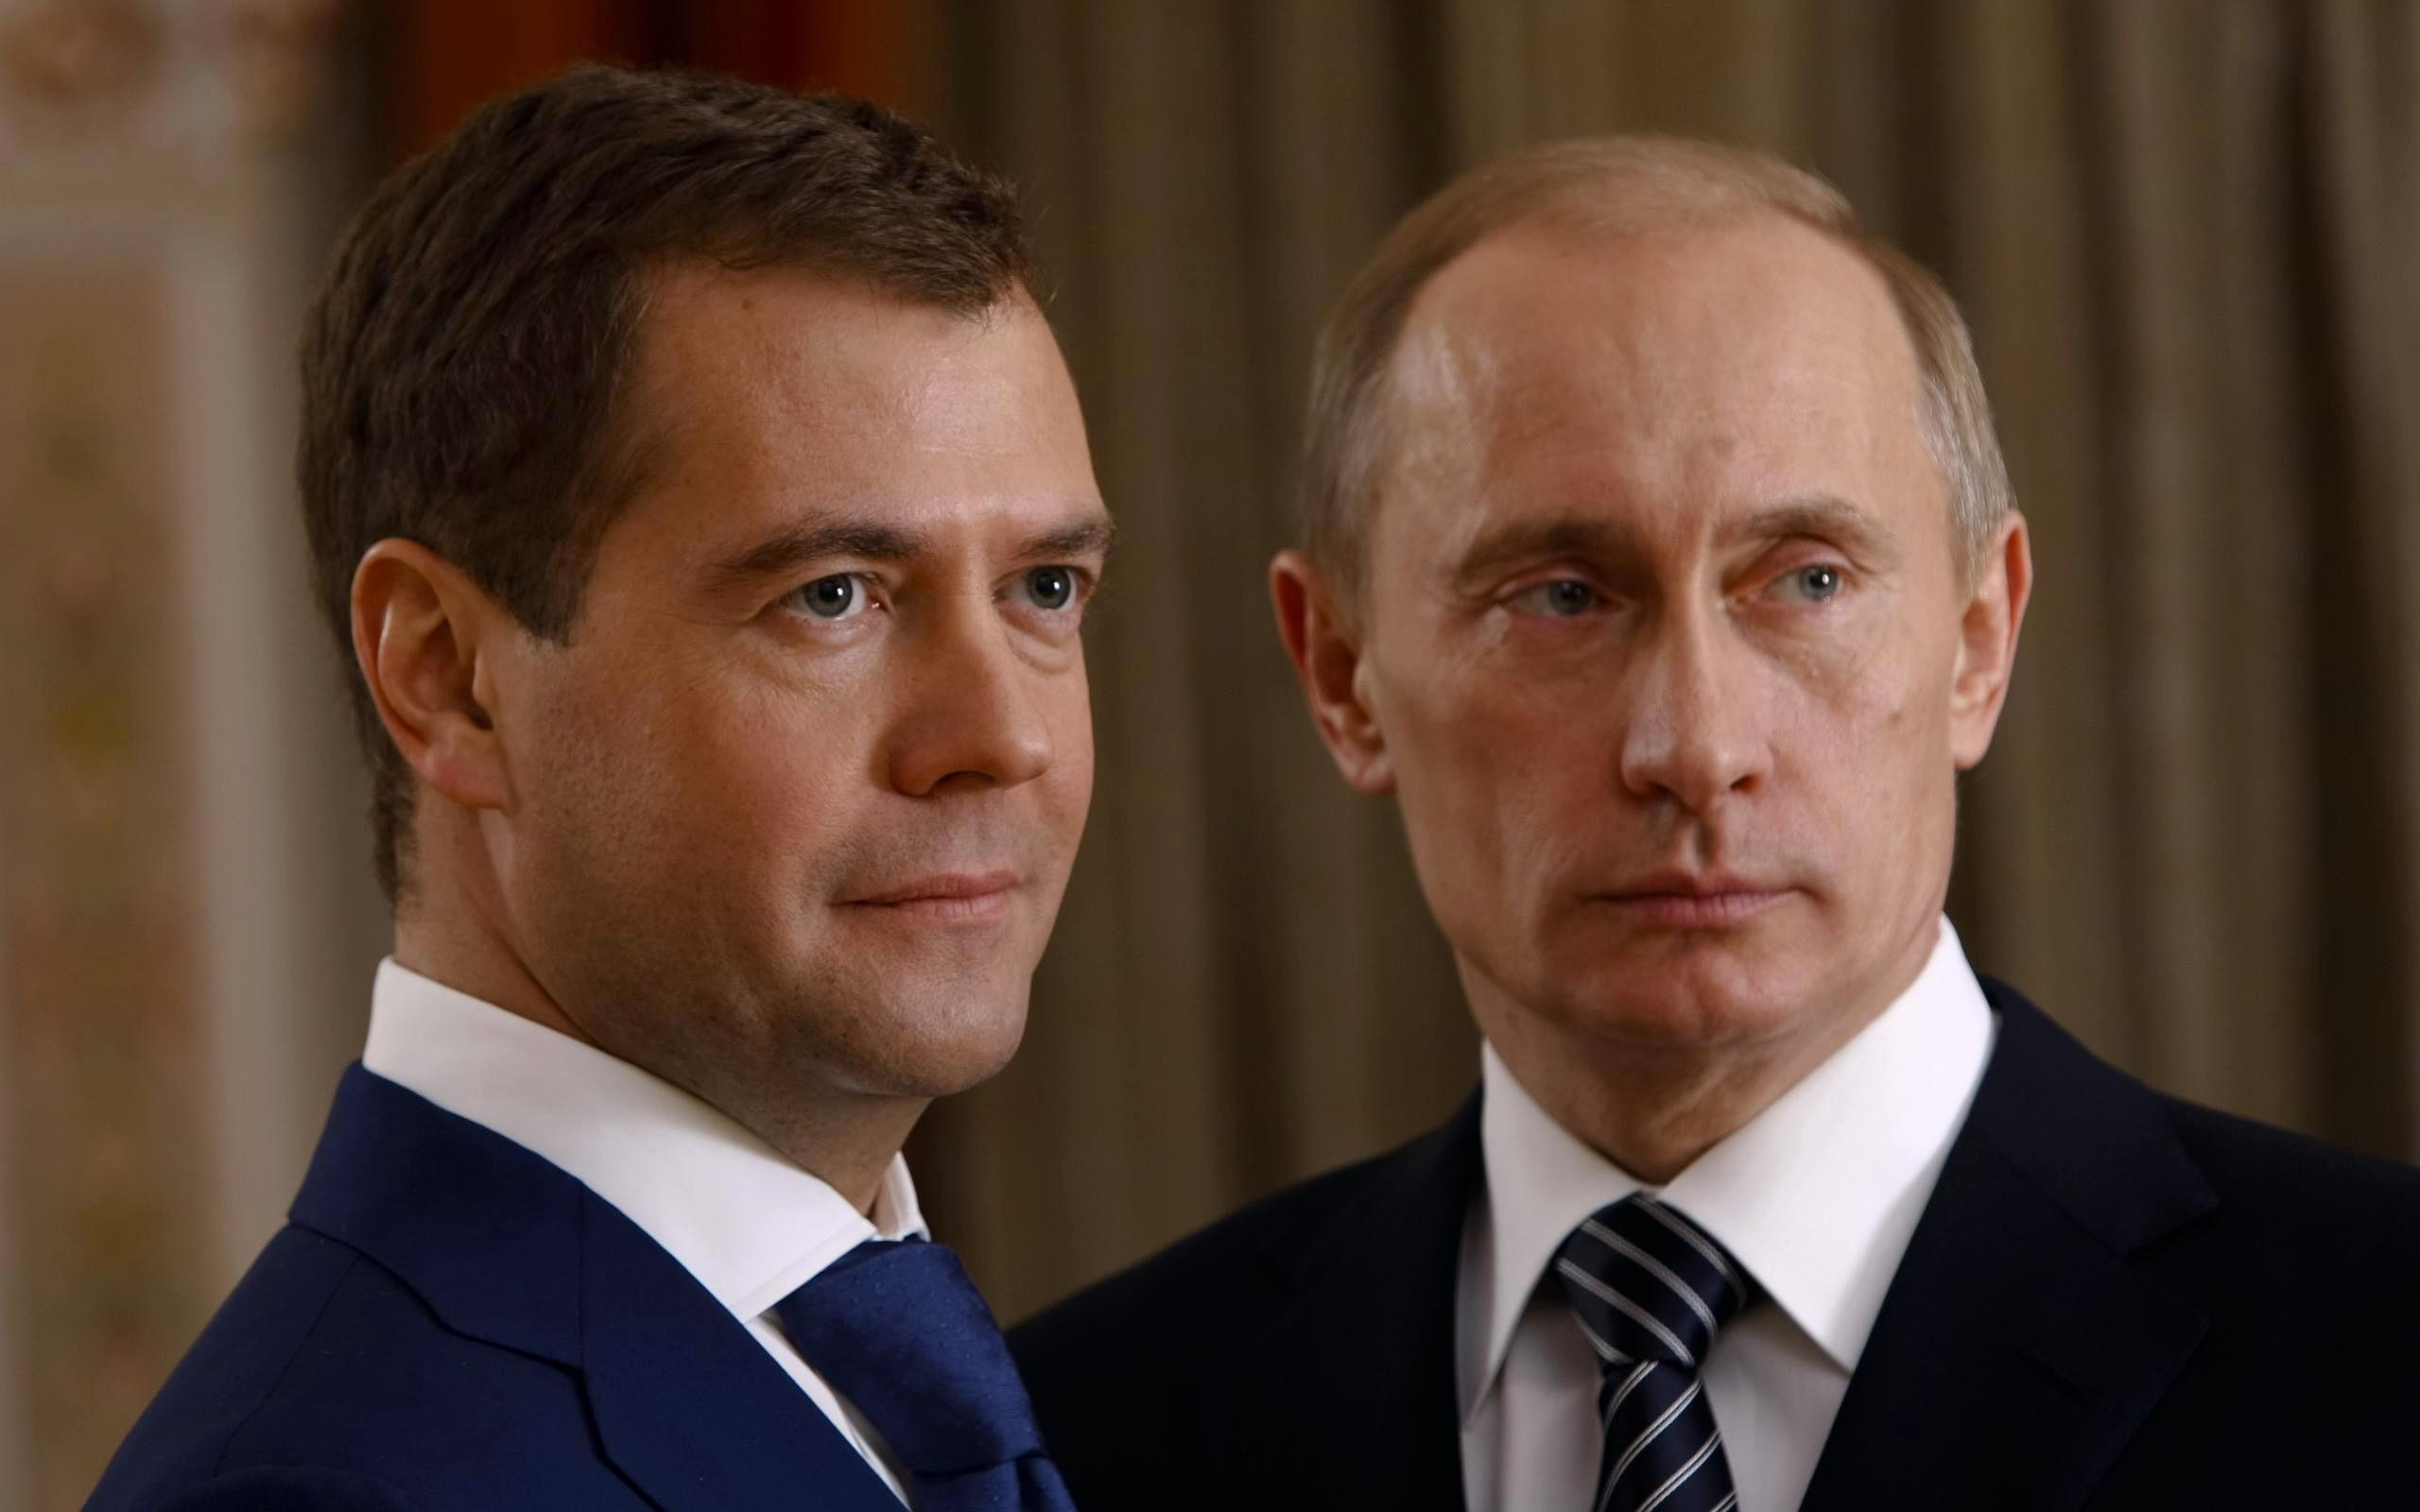 Картинки Владимир Путин Дмитрий Медведев Президент Знаменитости